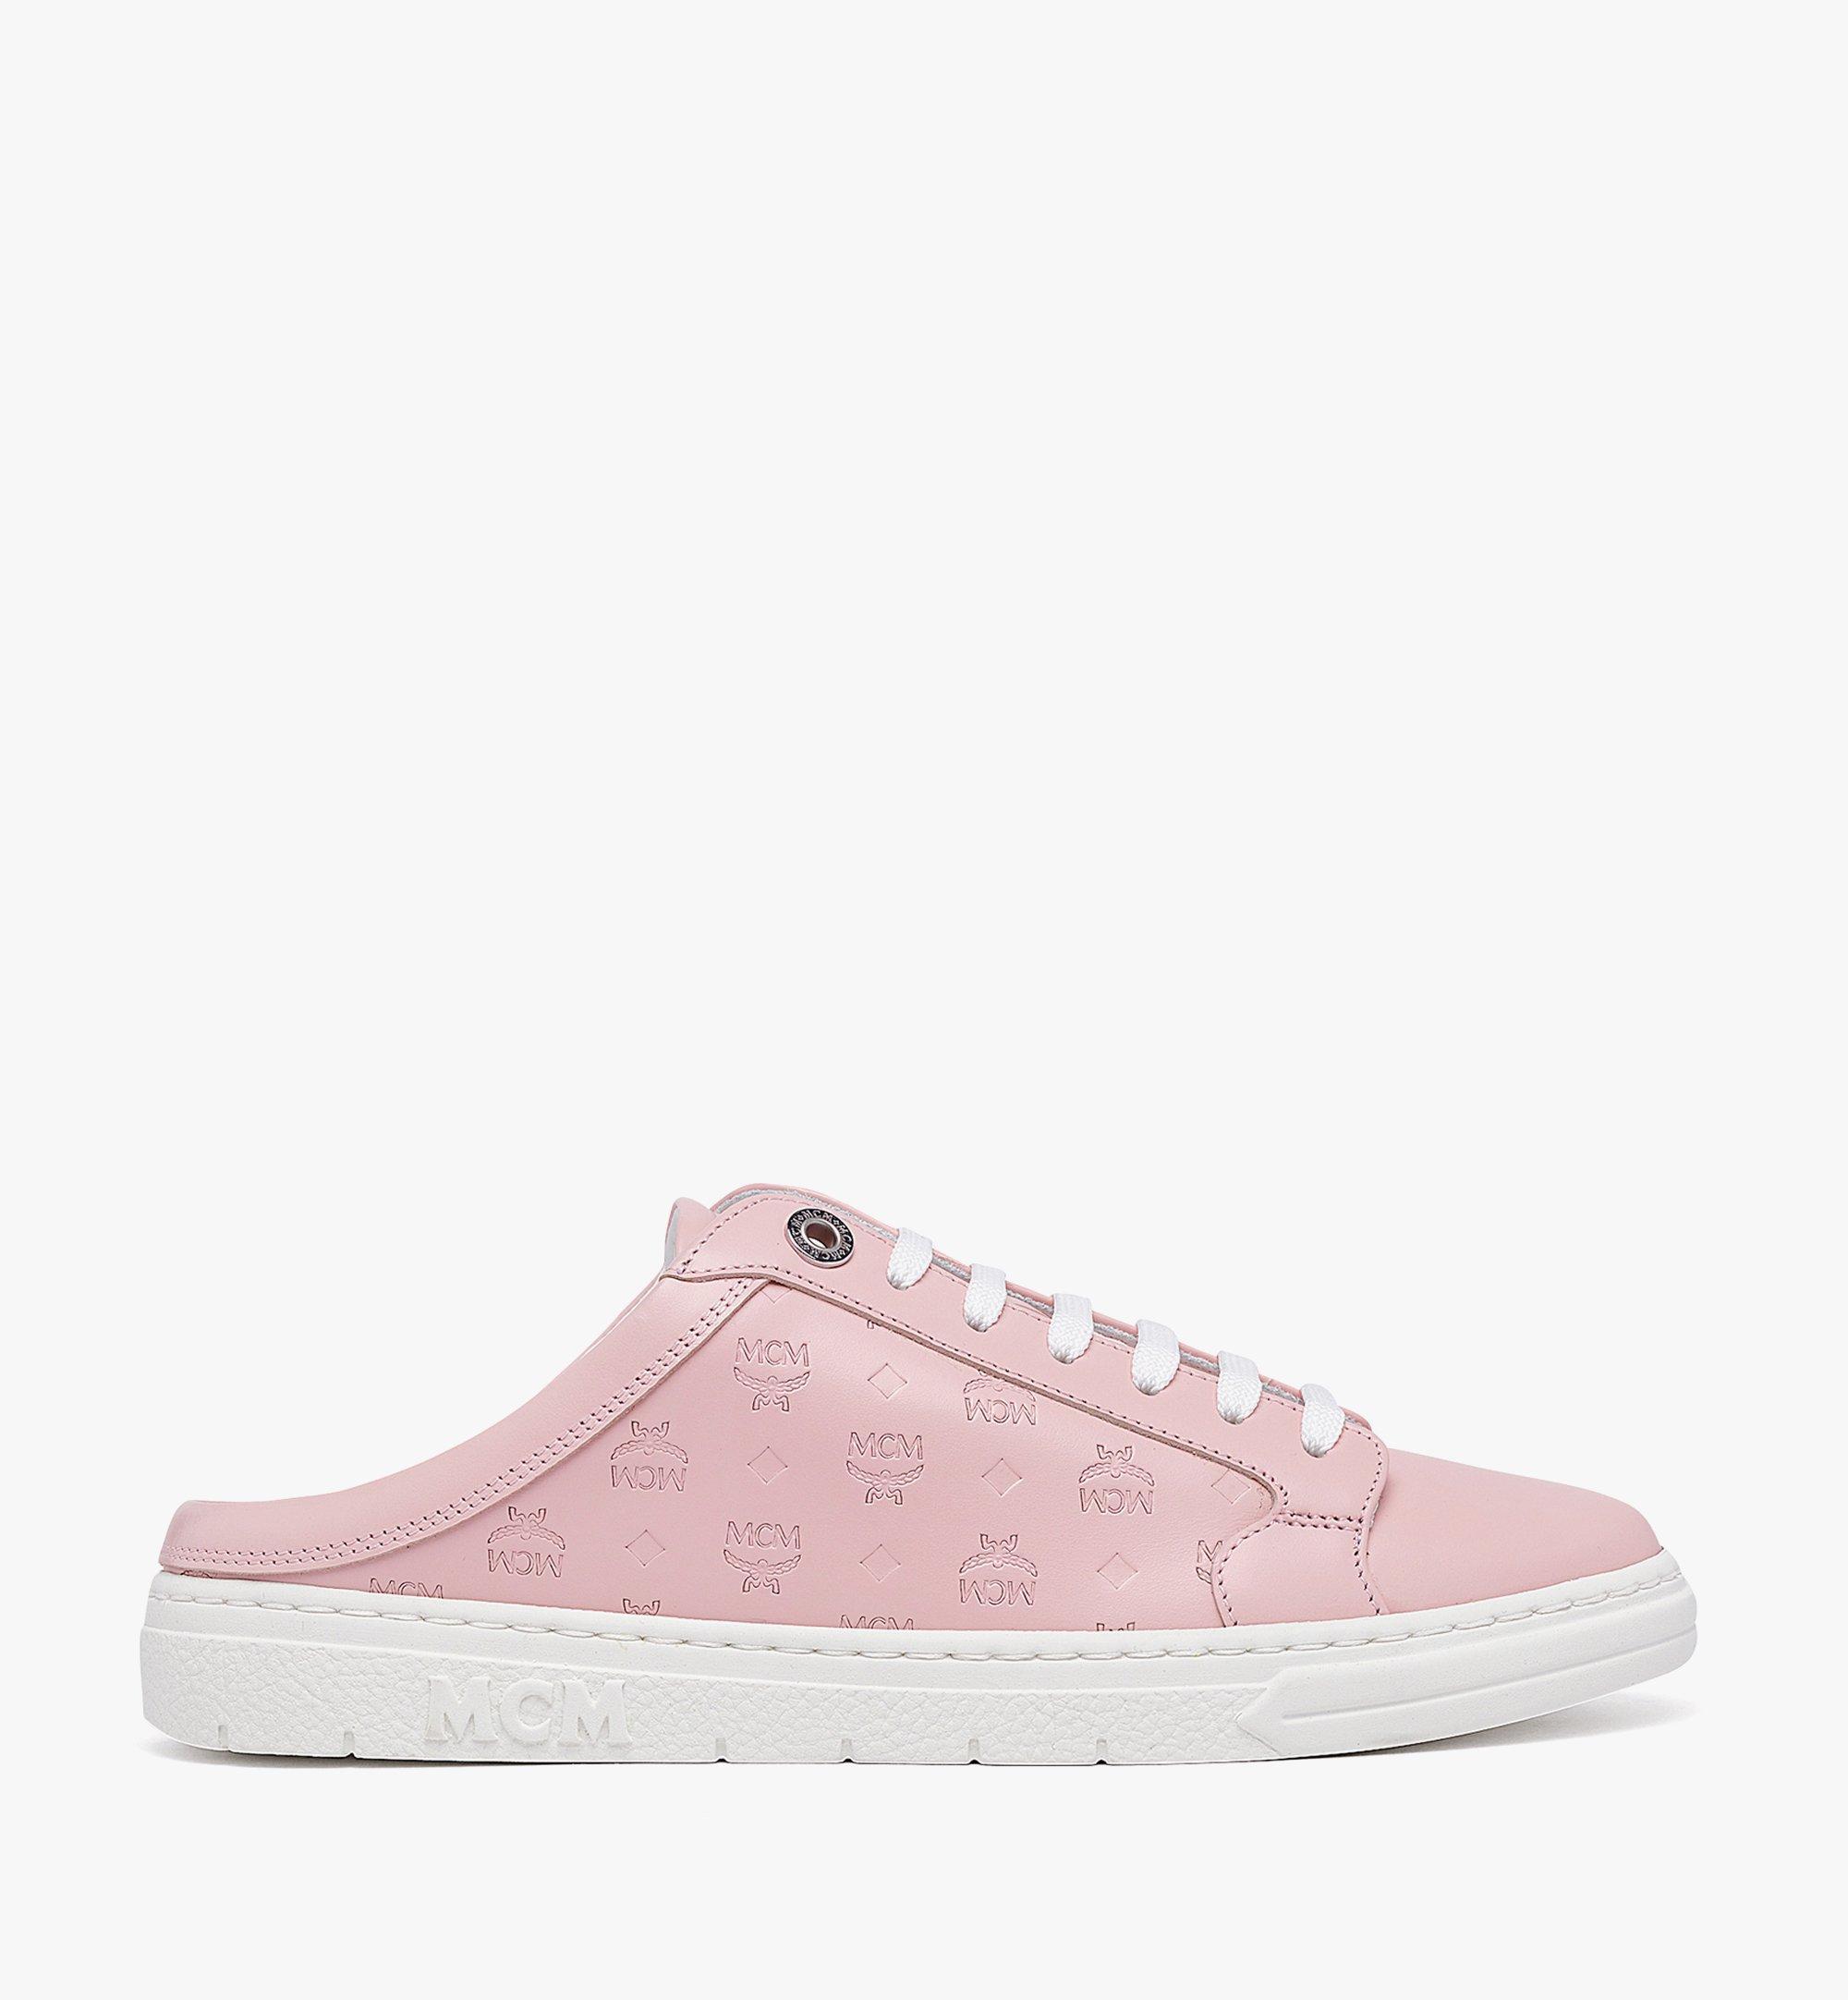 MCM Women's Terrain Lo Open Back Sneakers in Monogram Calf Leather Pink MESBAMM03QH036 Alternate View 4